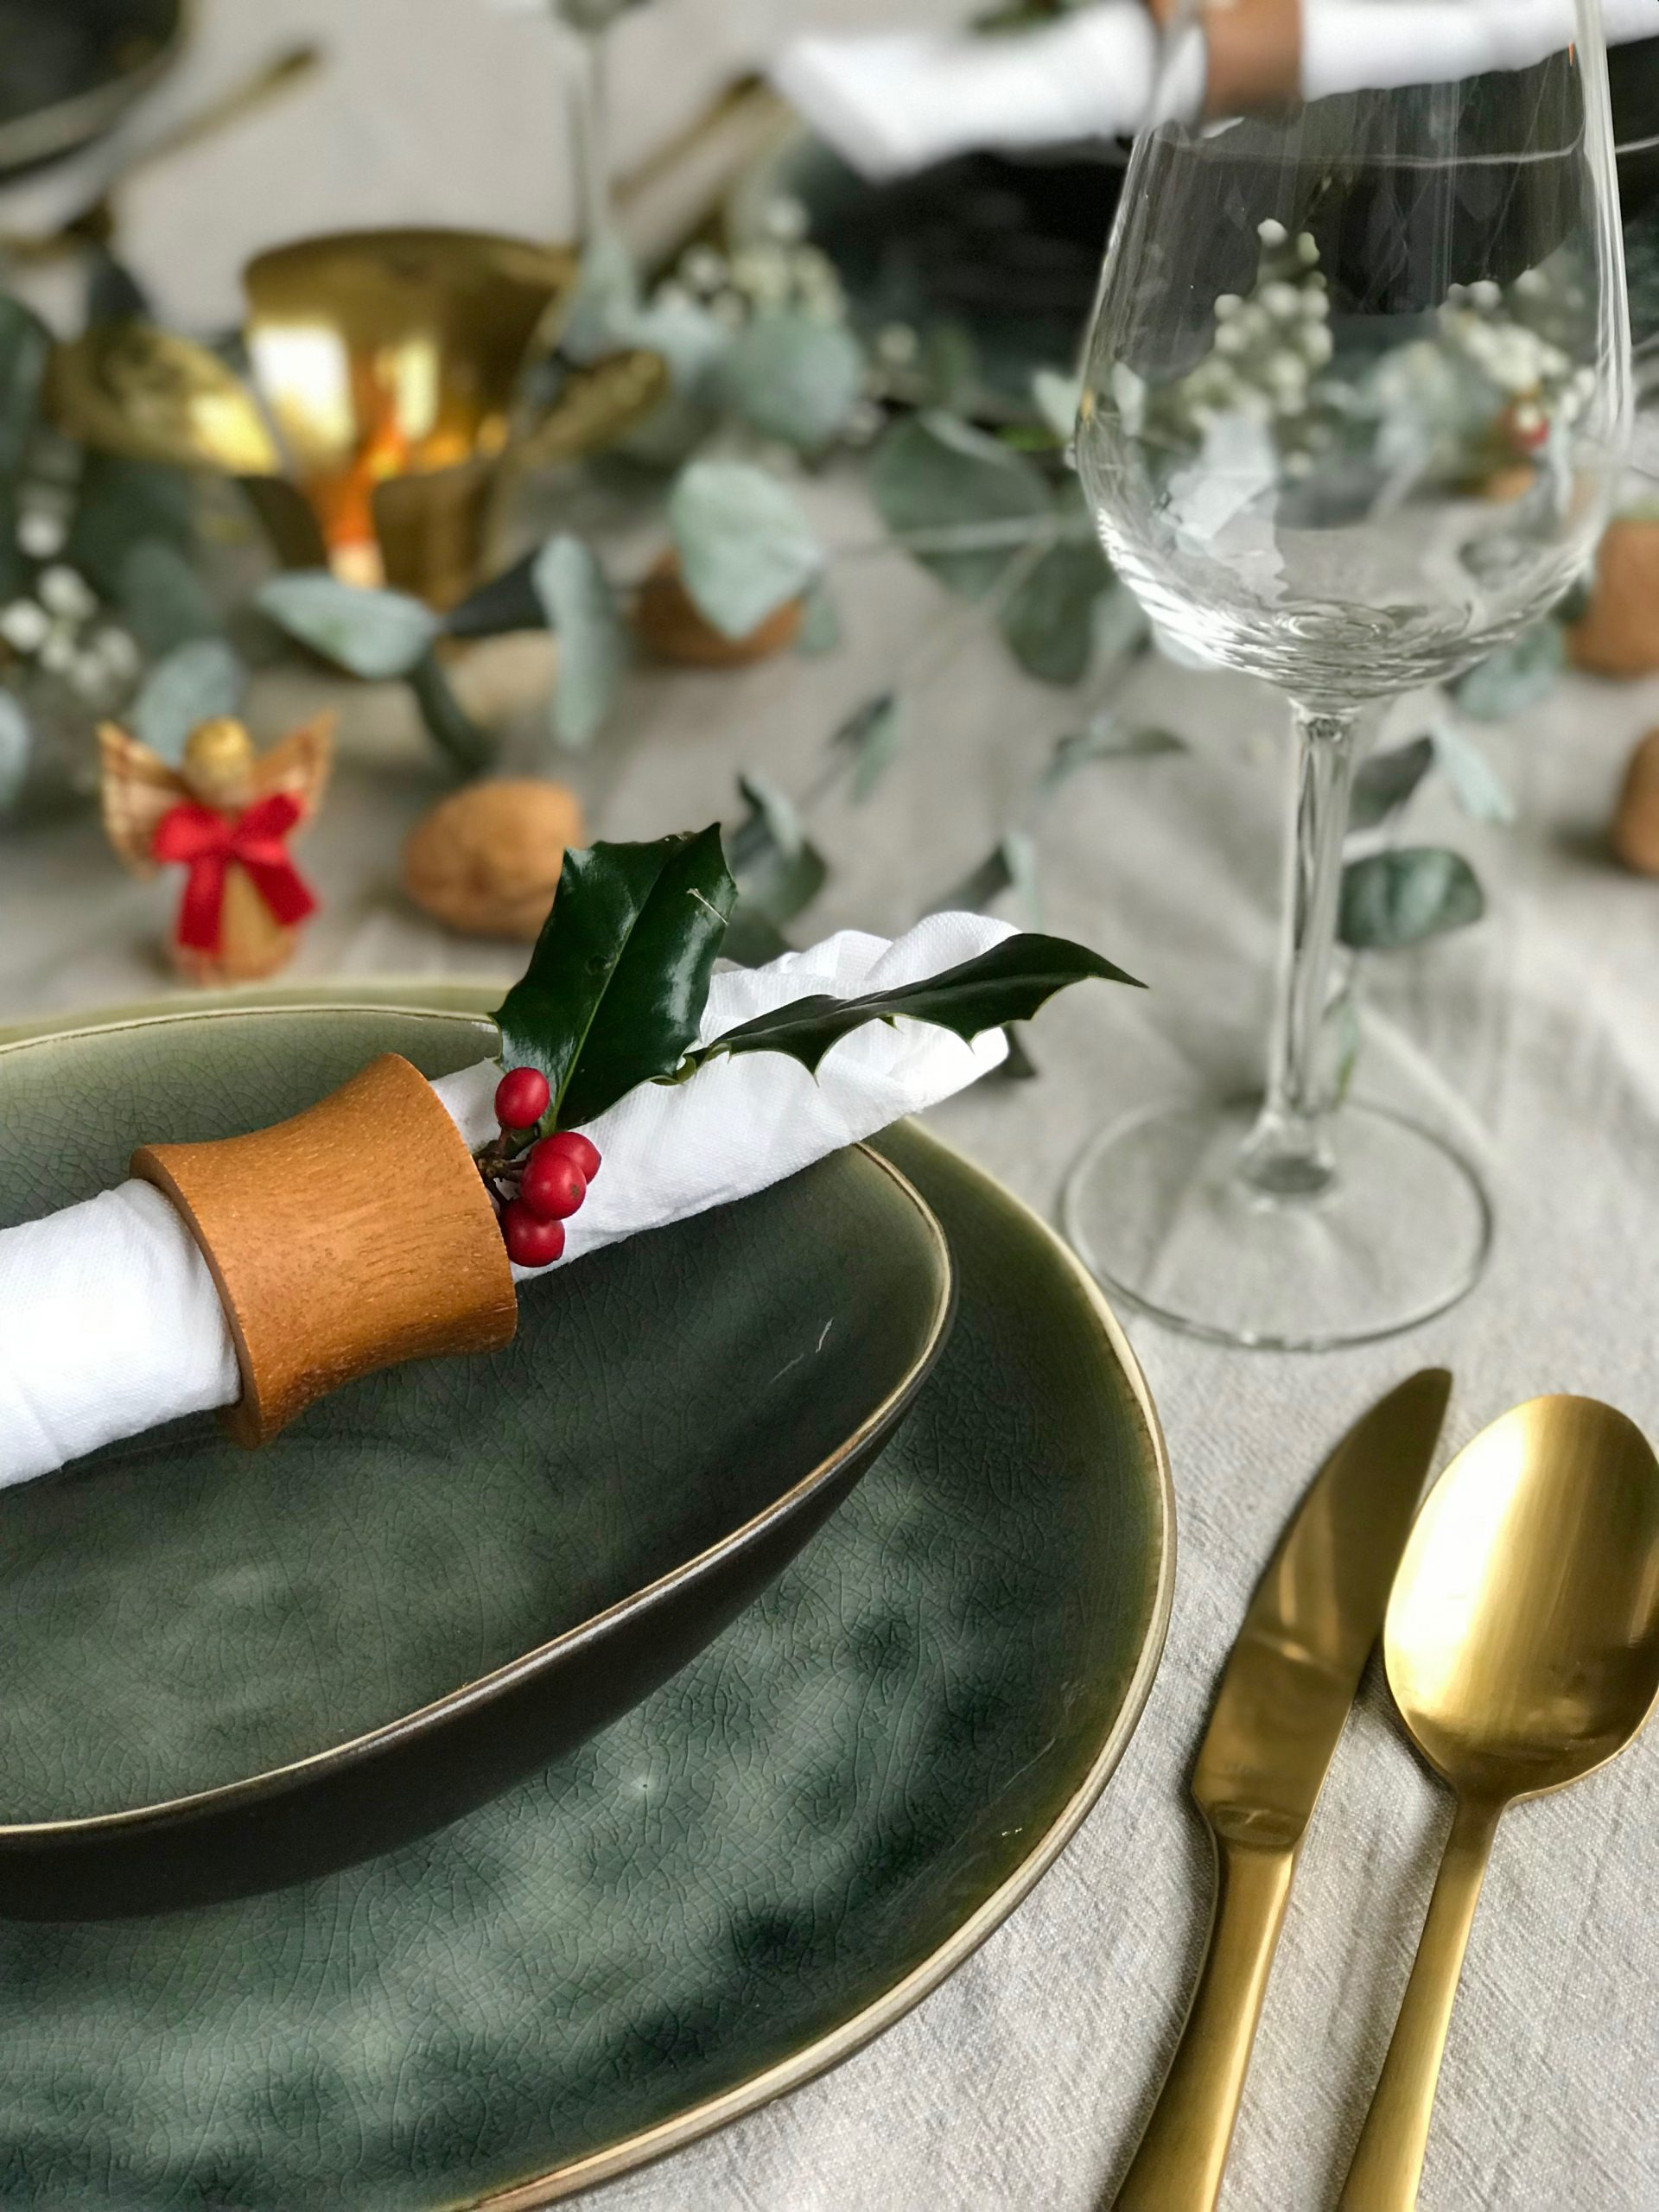 Healthy_holiday_table.jpg